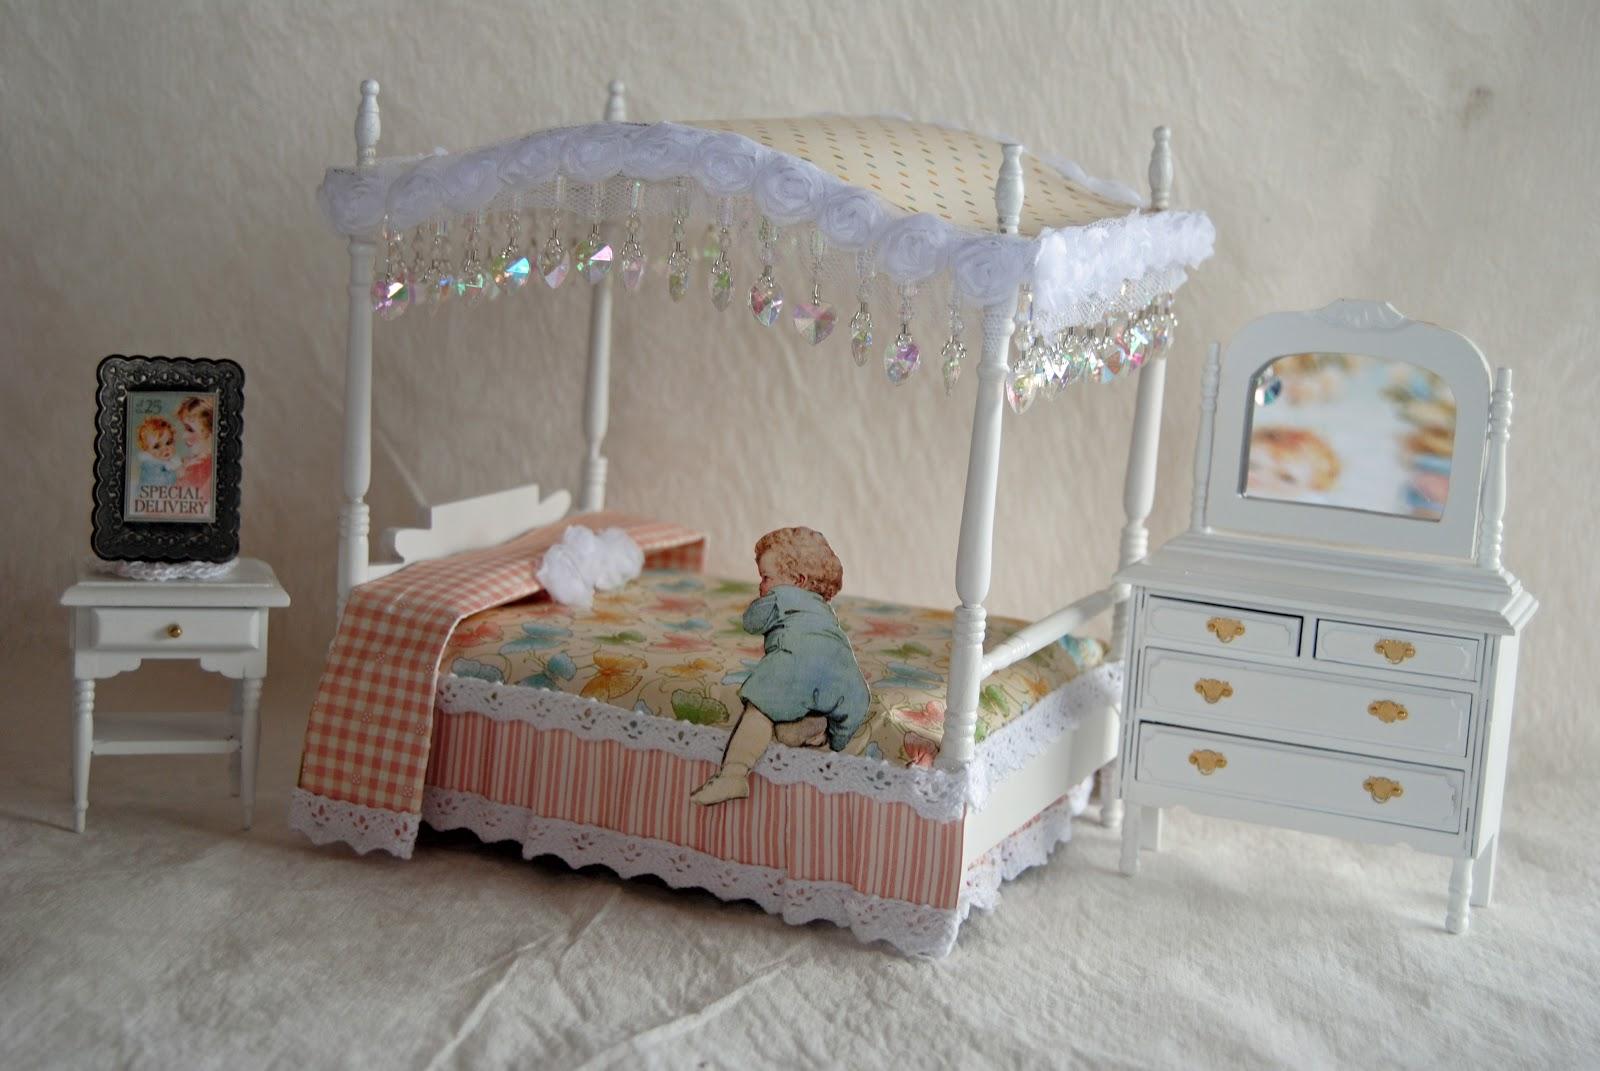 dollhouse bedroom set. doll house bedroom set dollhouse